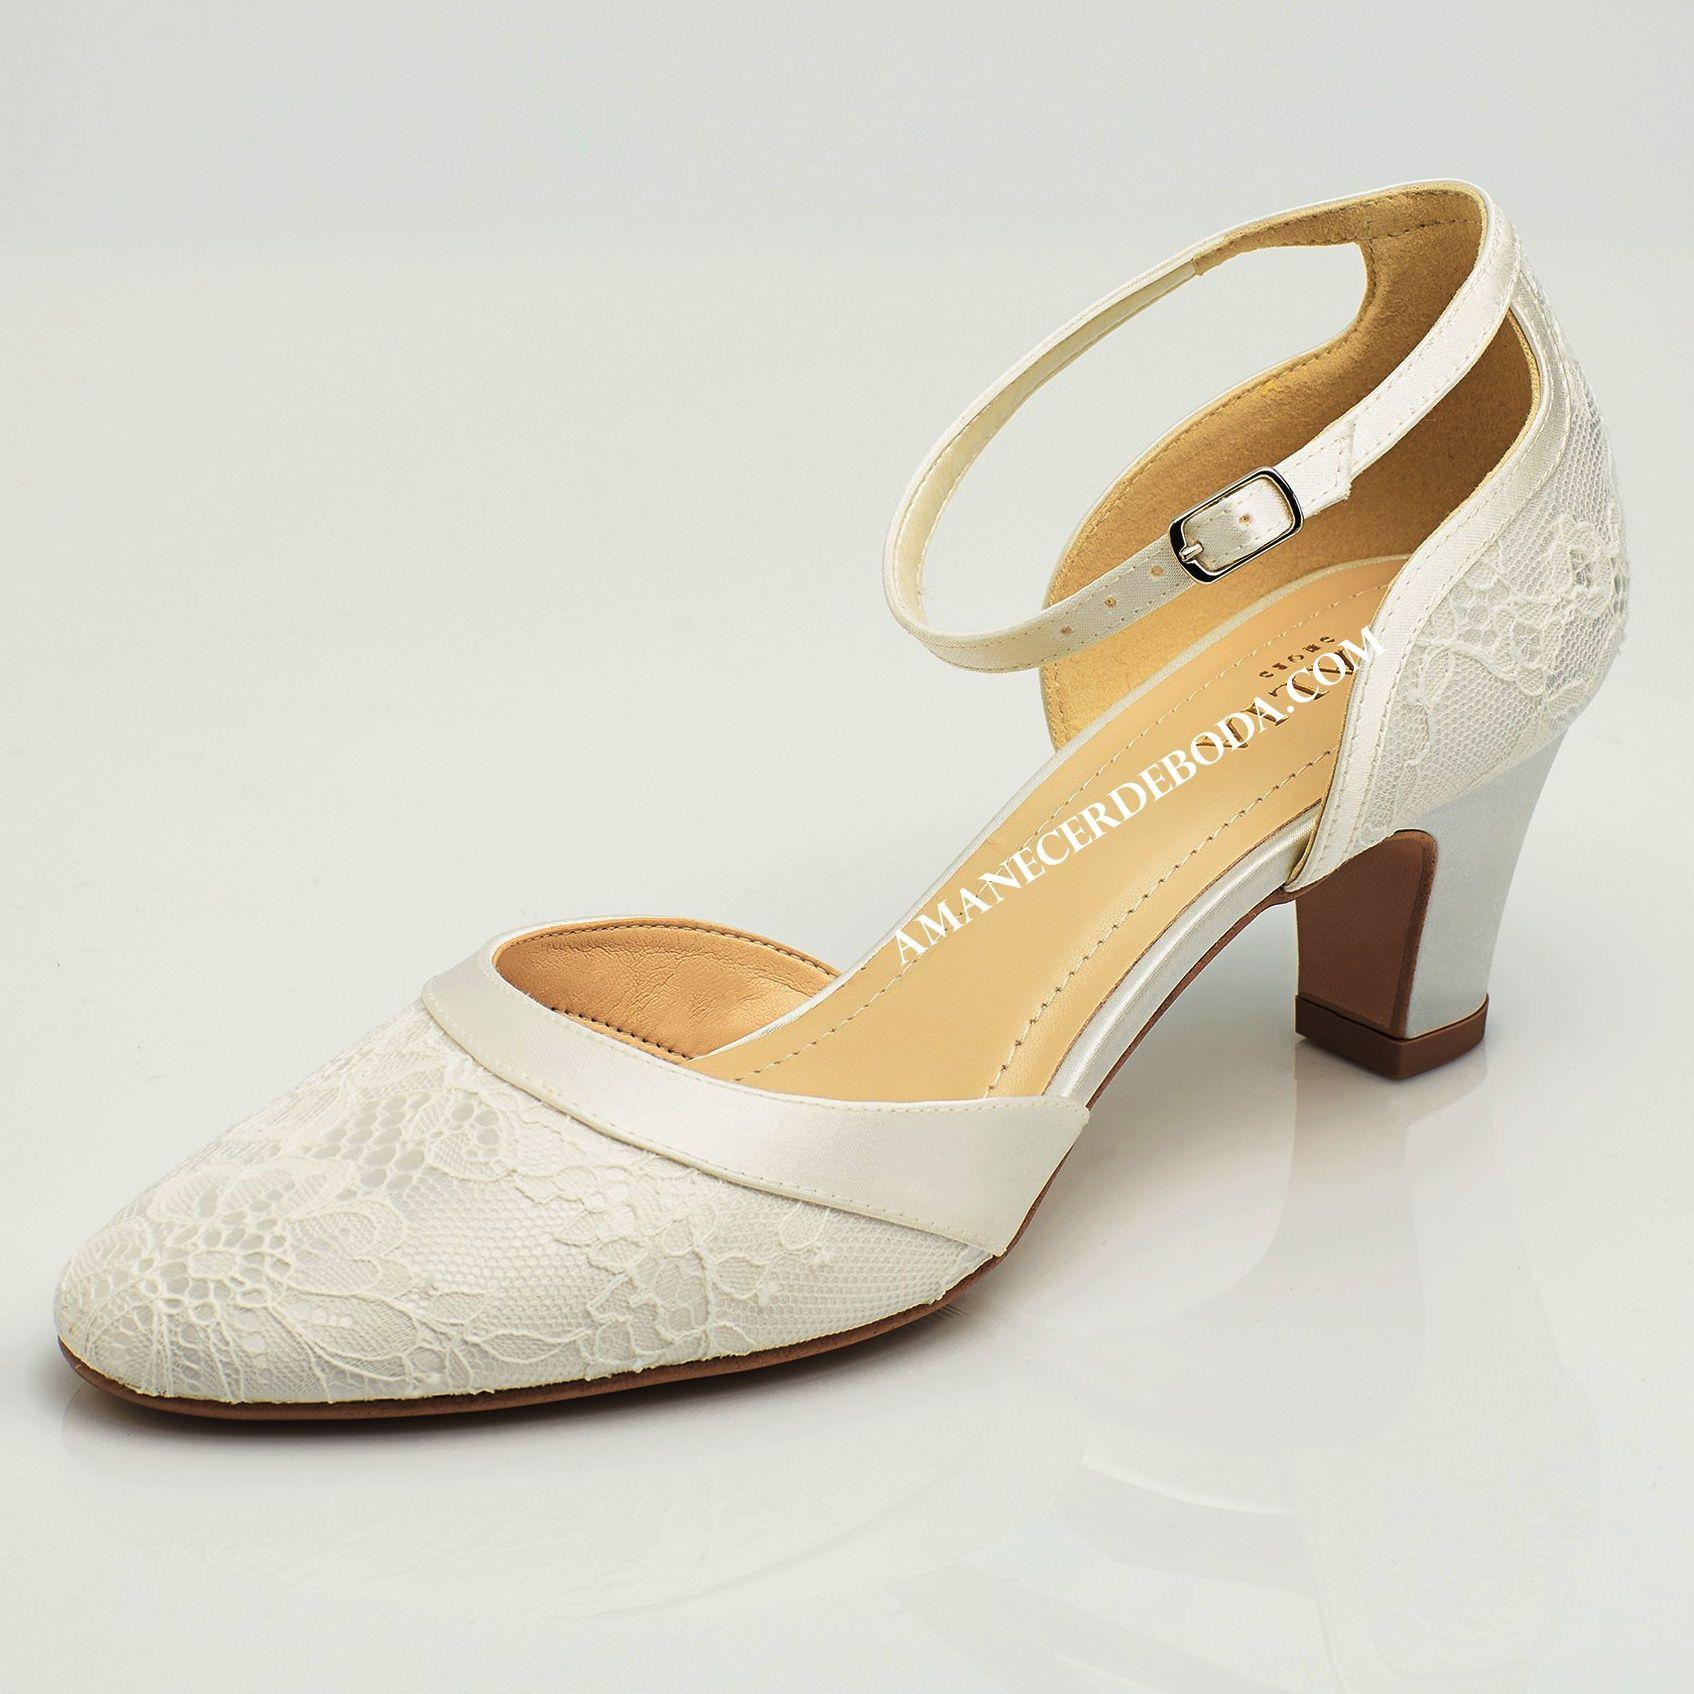 Zapatos de novia con poco tacón muy cómodos. Sapatos para noiva com saltos  baixos e mito cómodos b3a82872379a